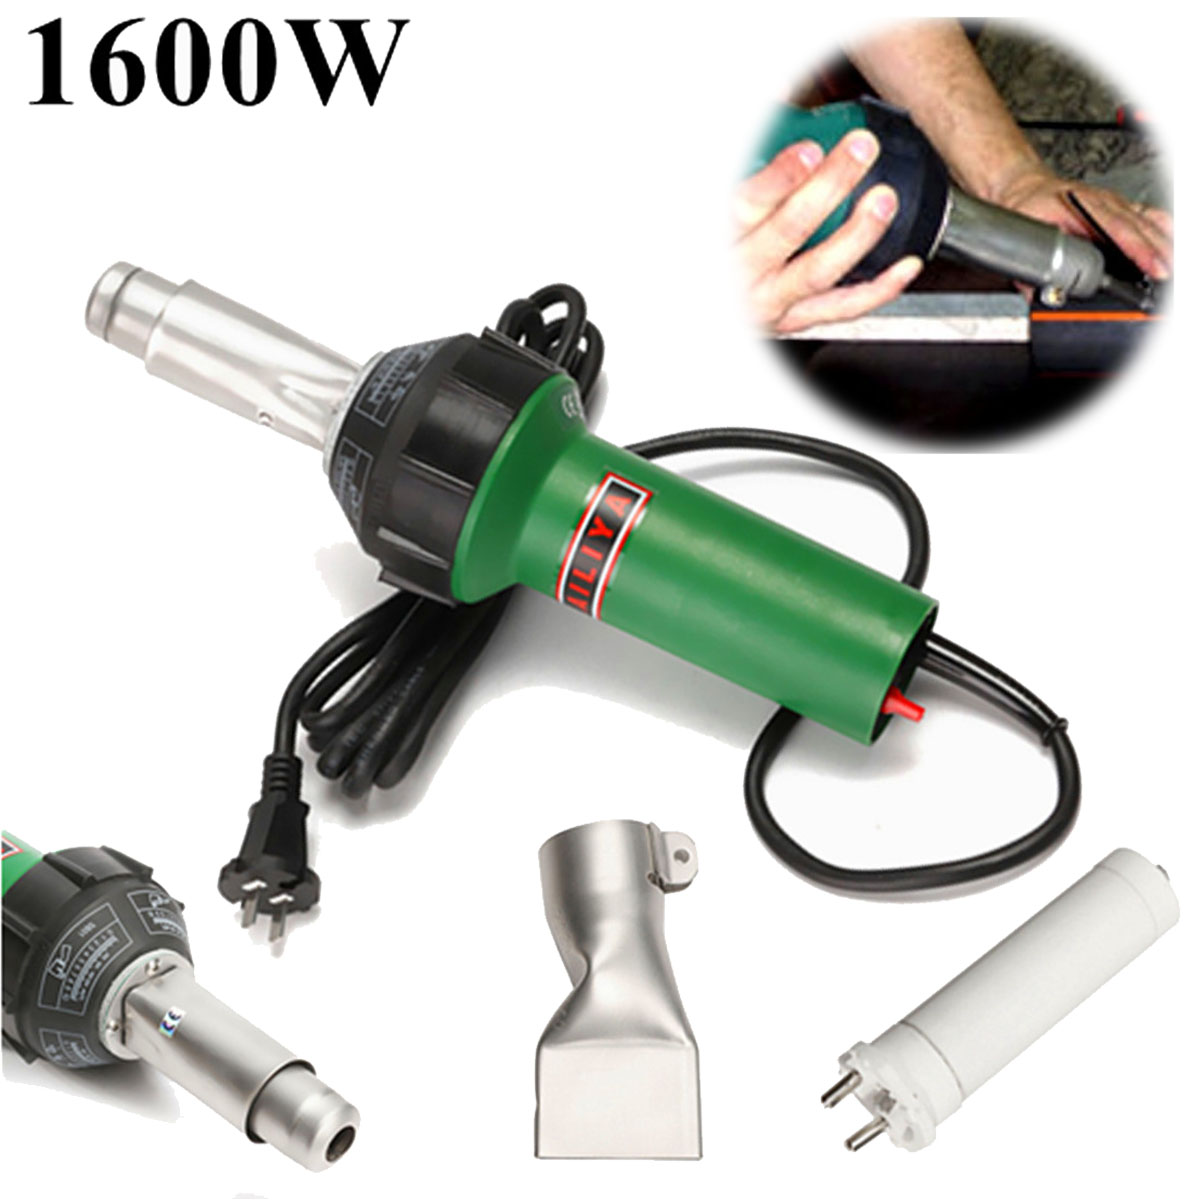 New AC 220V 1600W 50/60Hz Hot Air Torch Plastic Welding-Gun For Welder + Flat Nose Wholesale Price